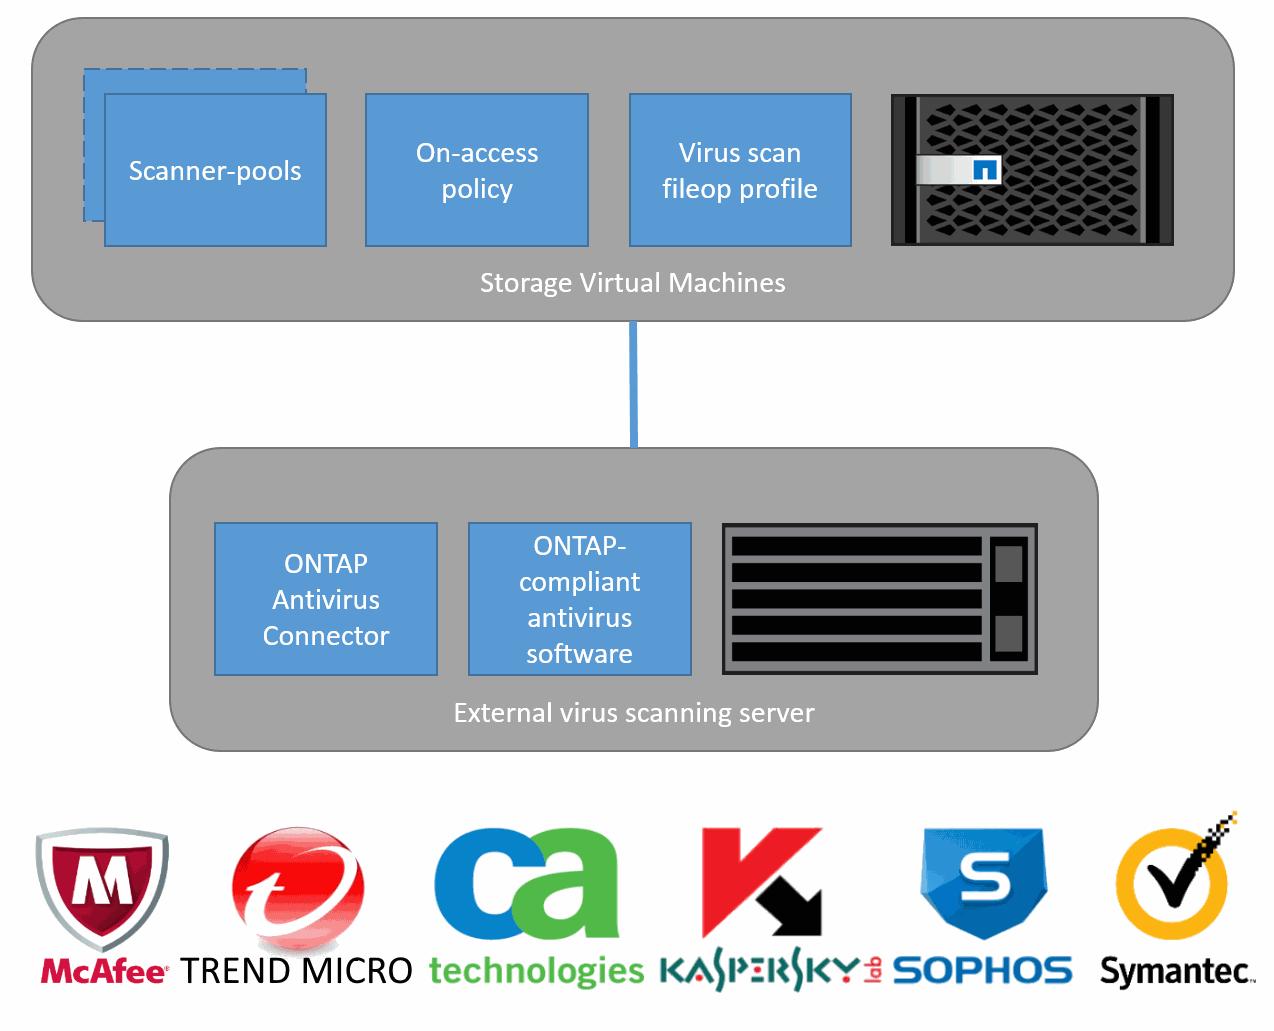 NetApp ONTAP и антивирусная защита NAS